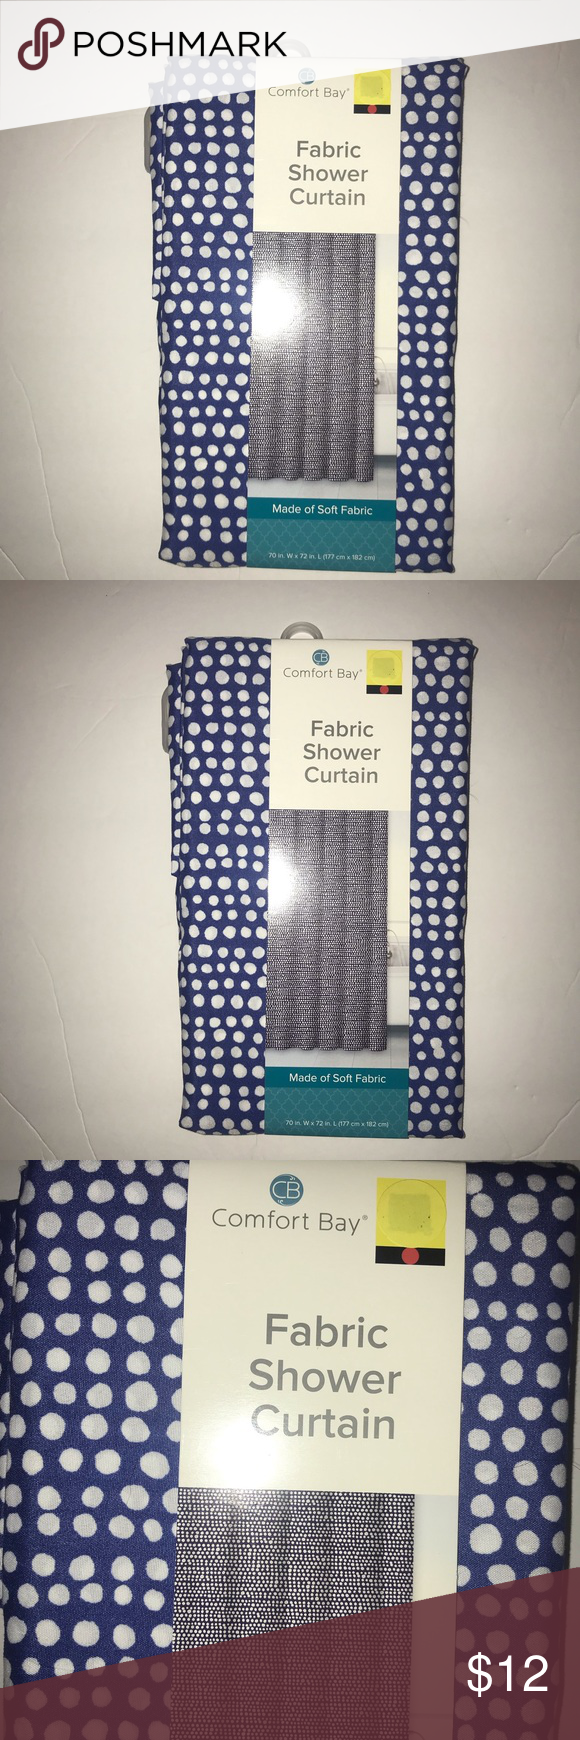 New Comfort Bay Textured Fabric Shower Curtain New Comfort Bay